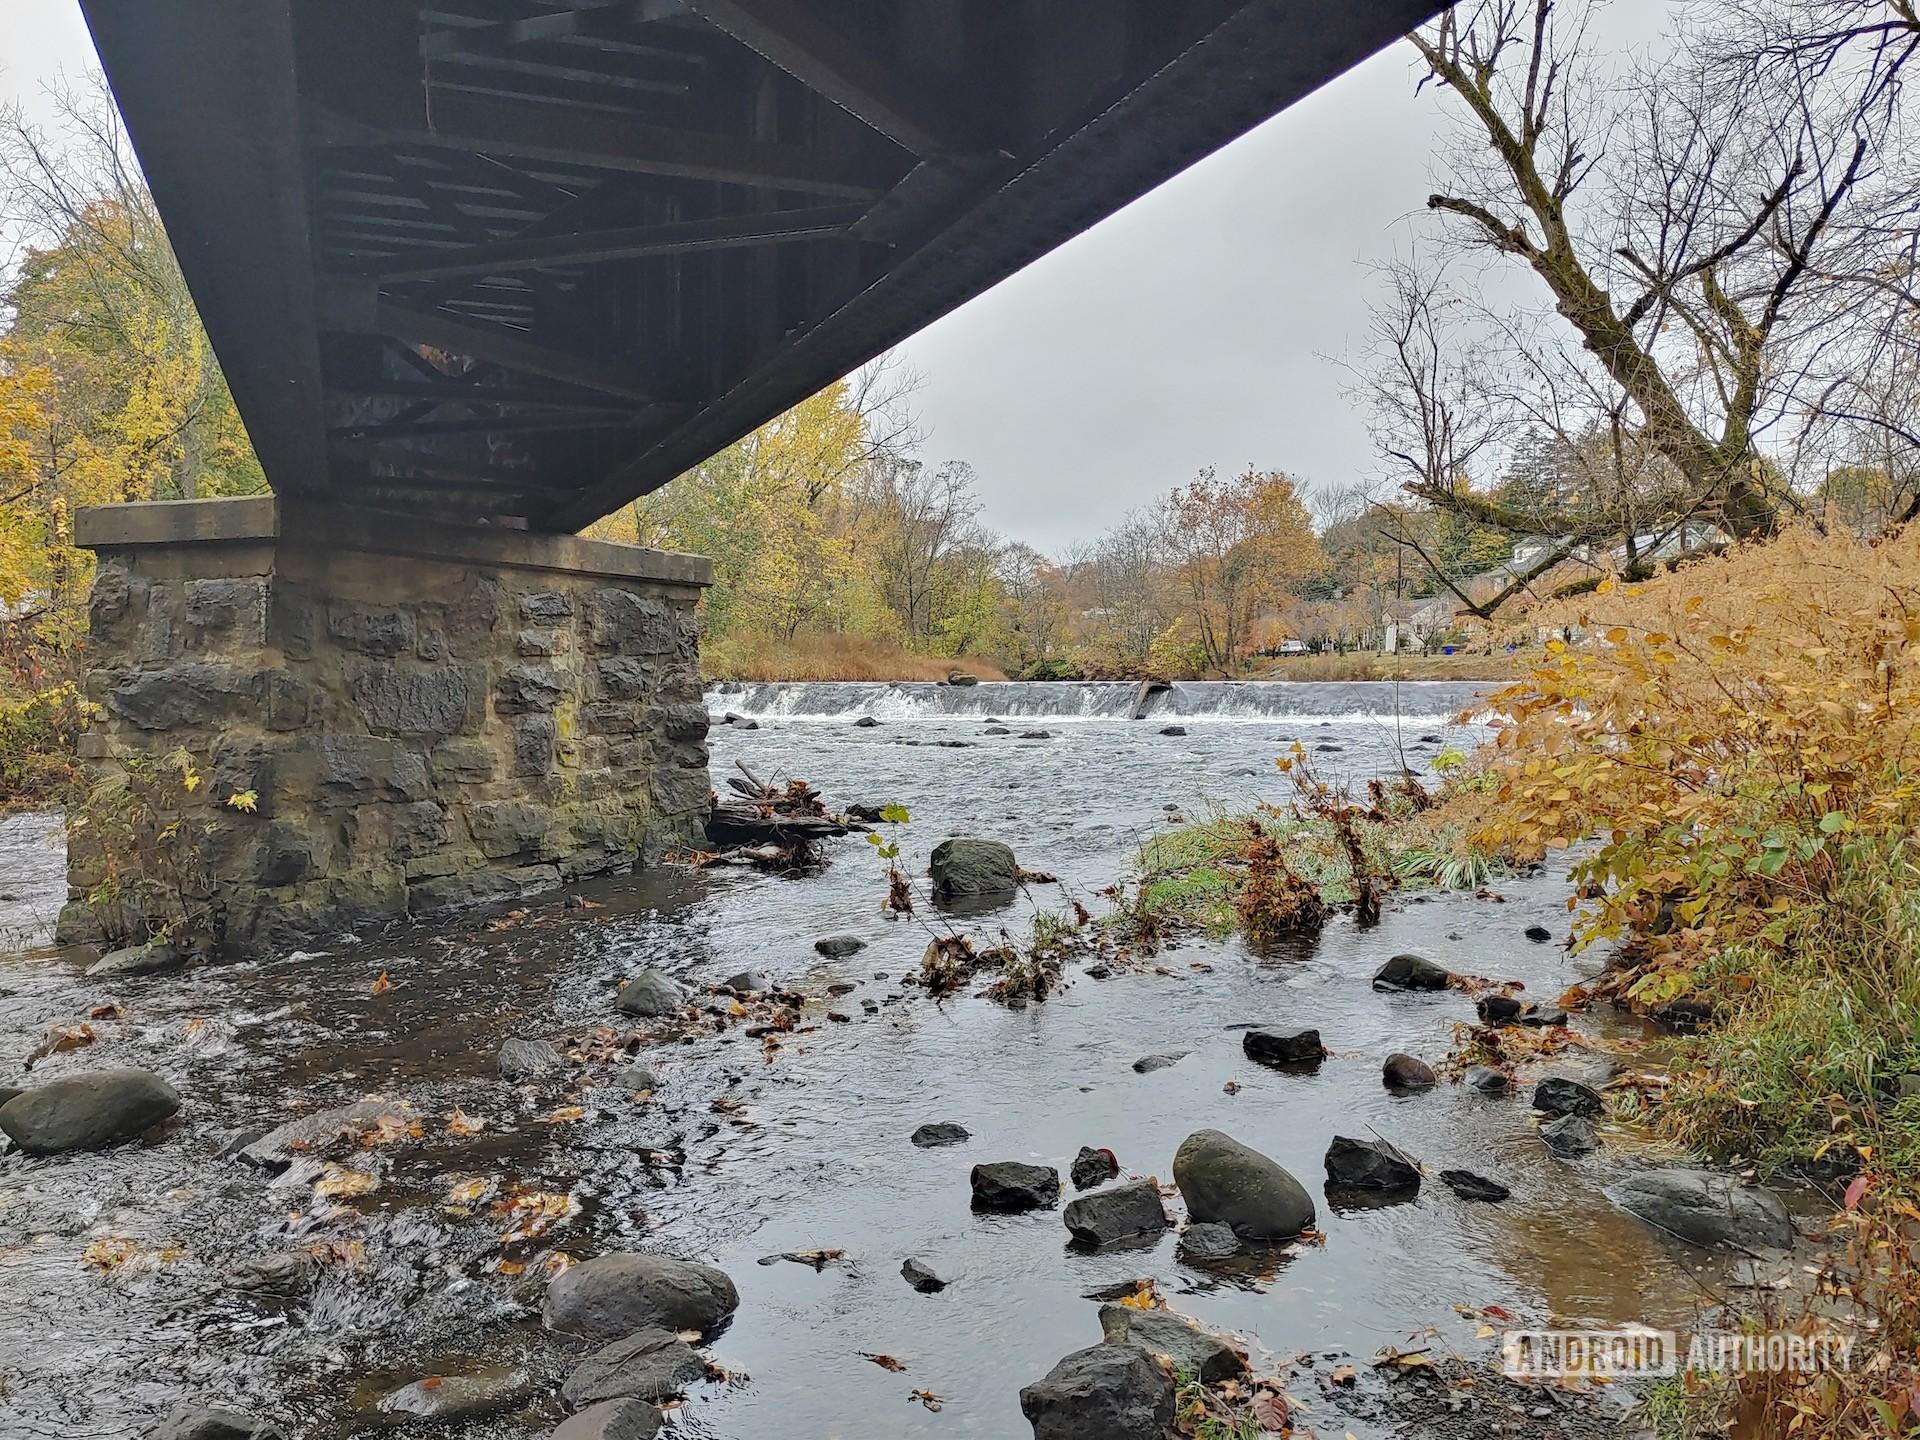 LG G8X ThinQ Review photo sample under the bridge